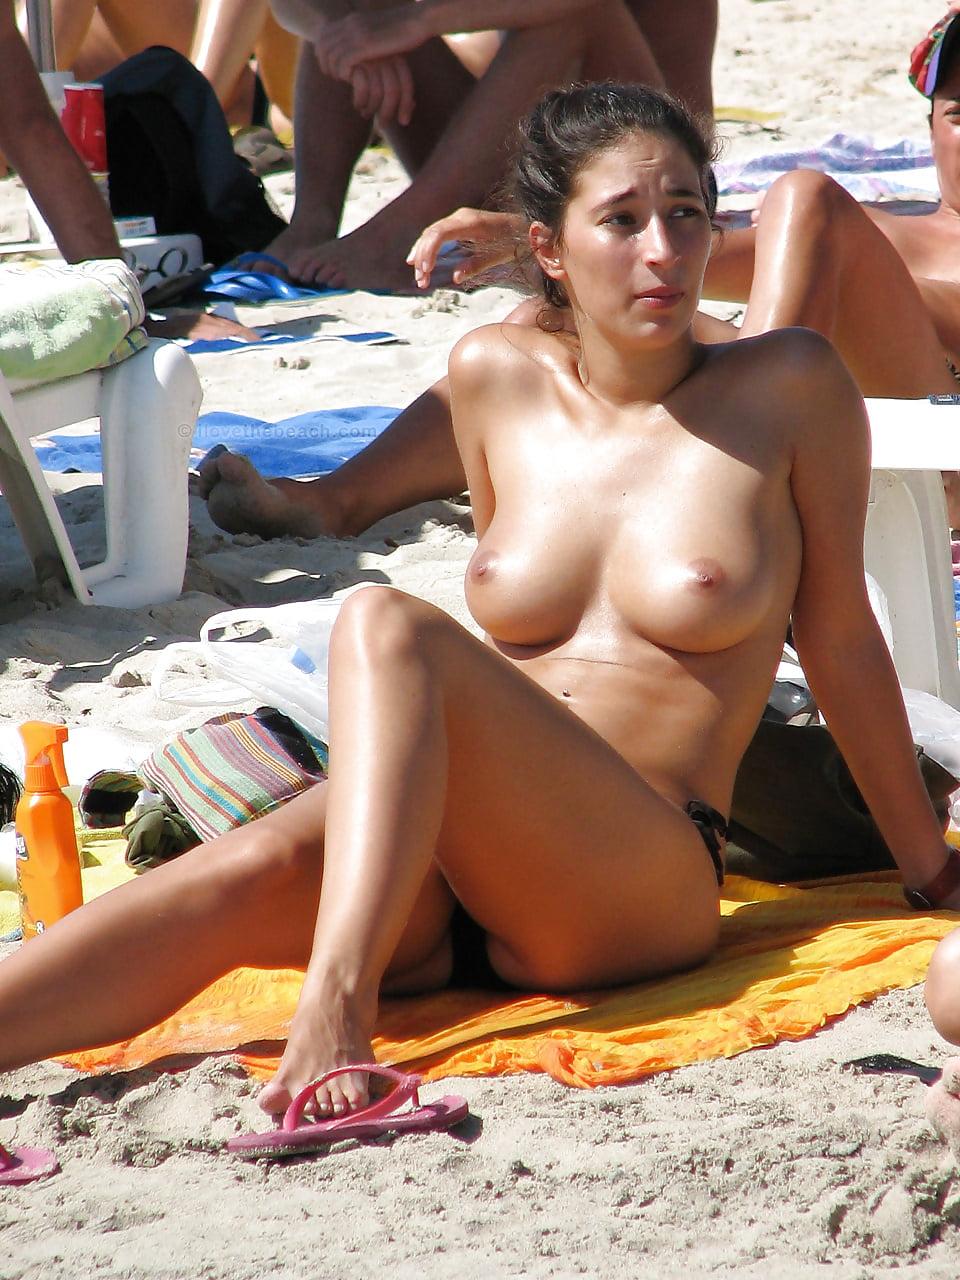 Bisexual spanish naked beach babes fucking boobgirl